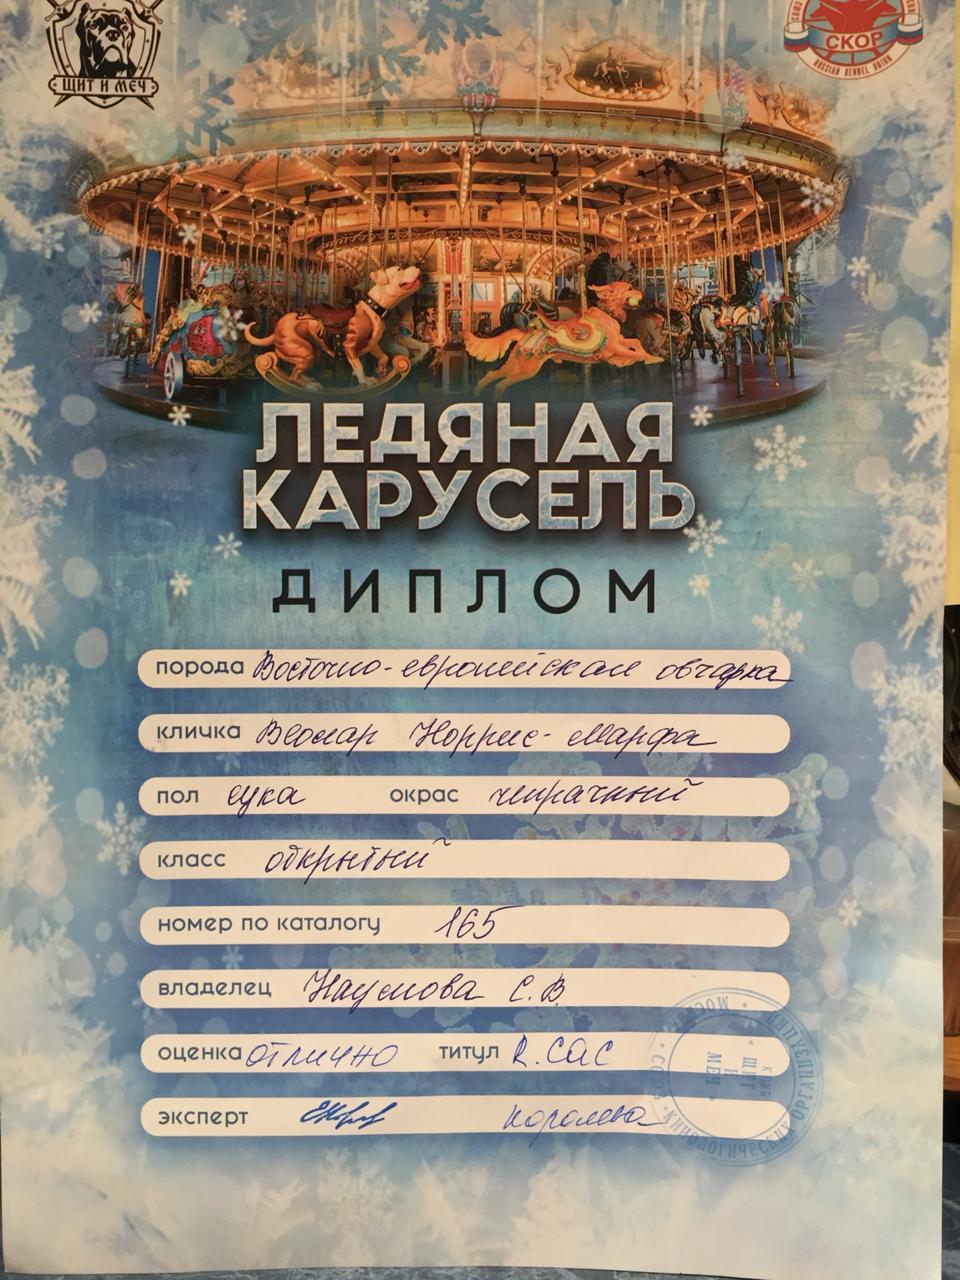 ВОСТОЧНО-ЕВРОПЕЙСКАЯ ОВЧАРКА ВЕОЛАР НОРРИС-МАРФА - Страница 2 S_aaau10